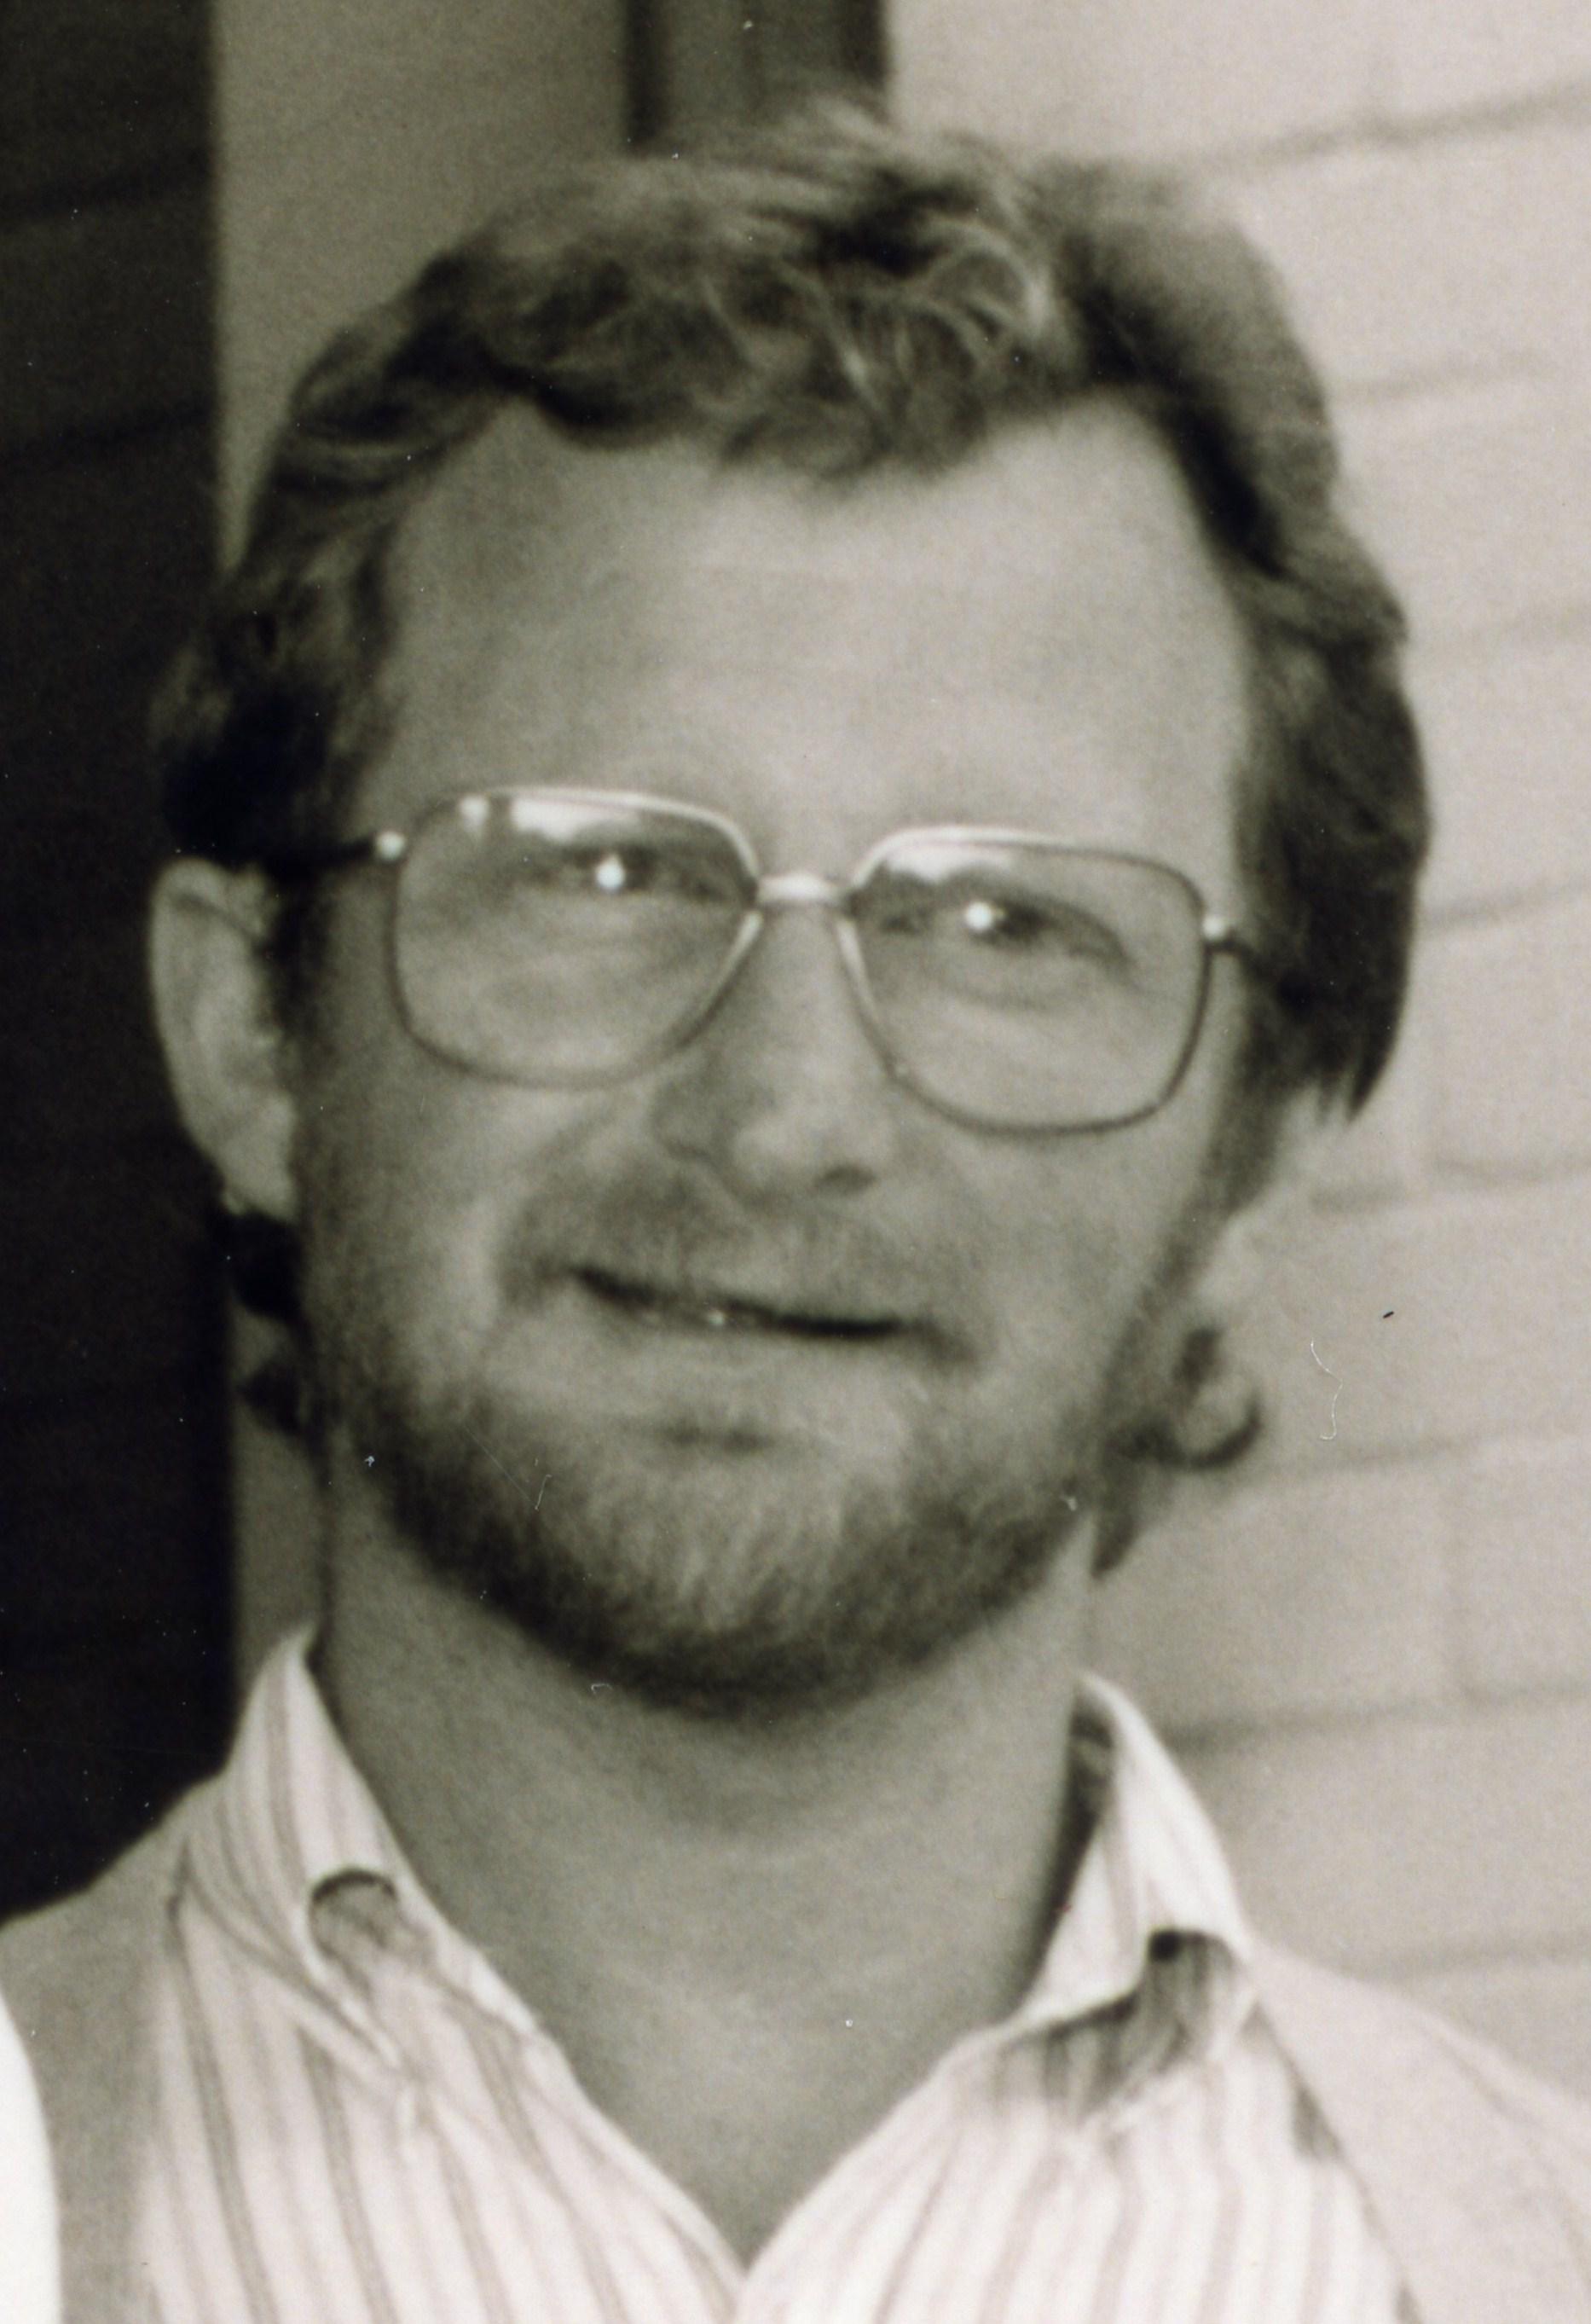 Steve Ripley